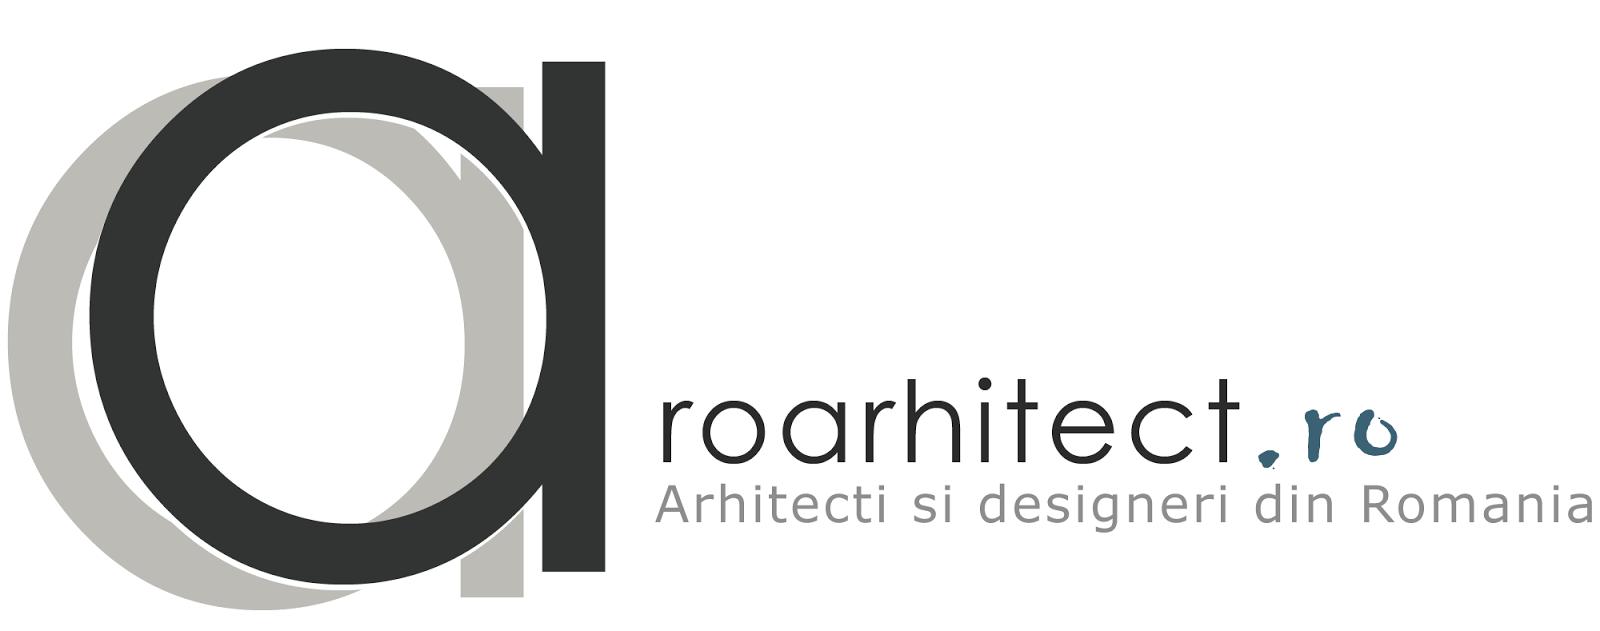 Roarhitect